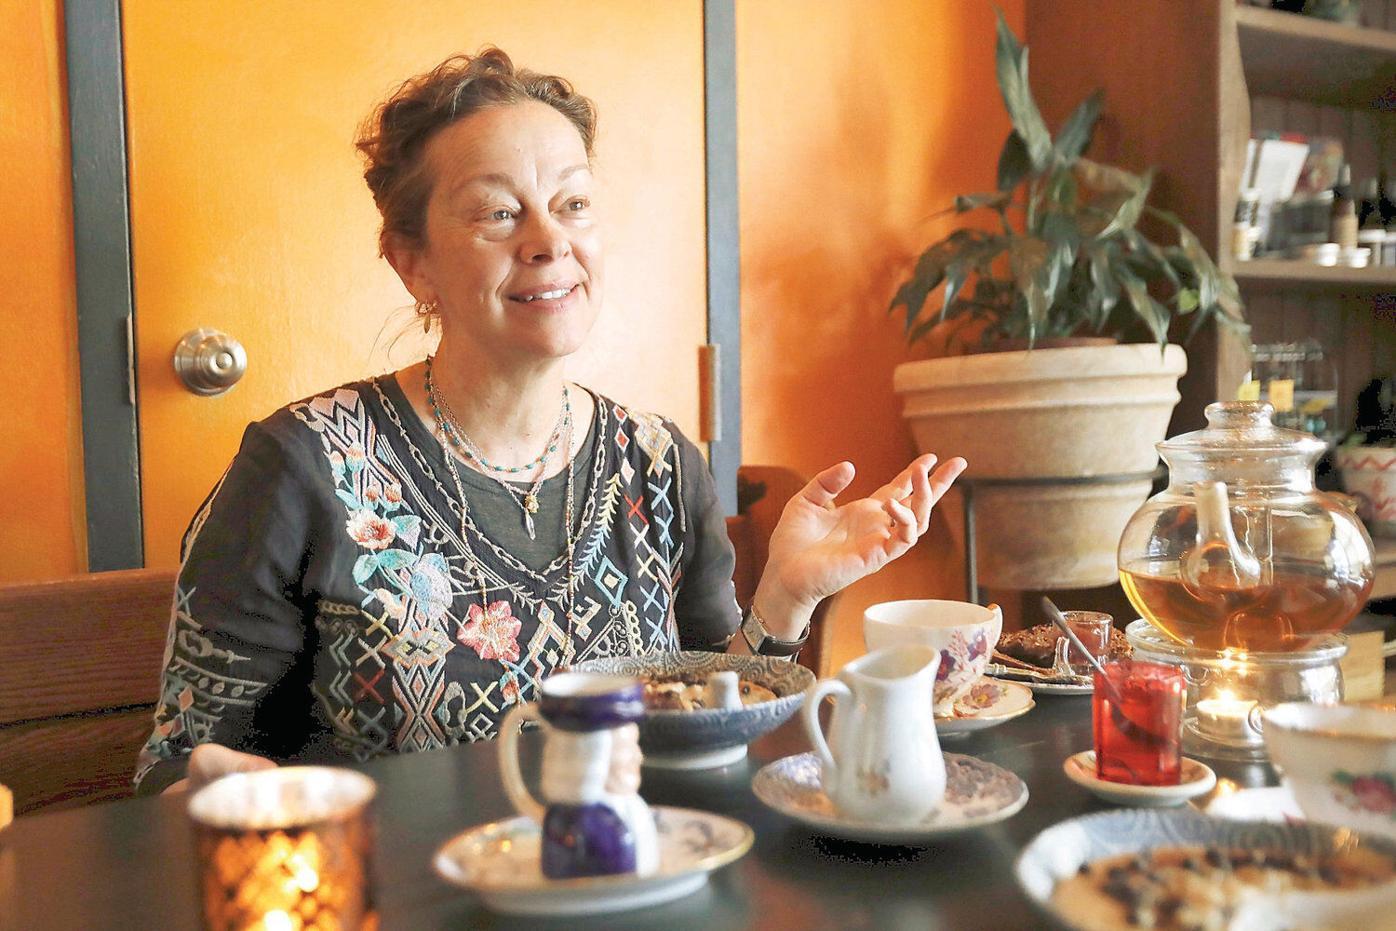 Illuminating the art of Armenian women with Suzi Banks Baum